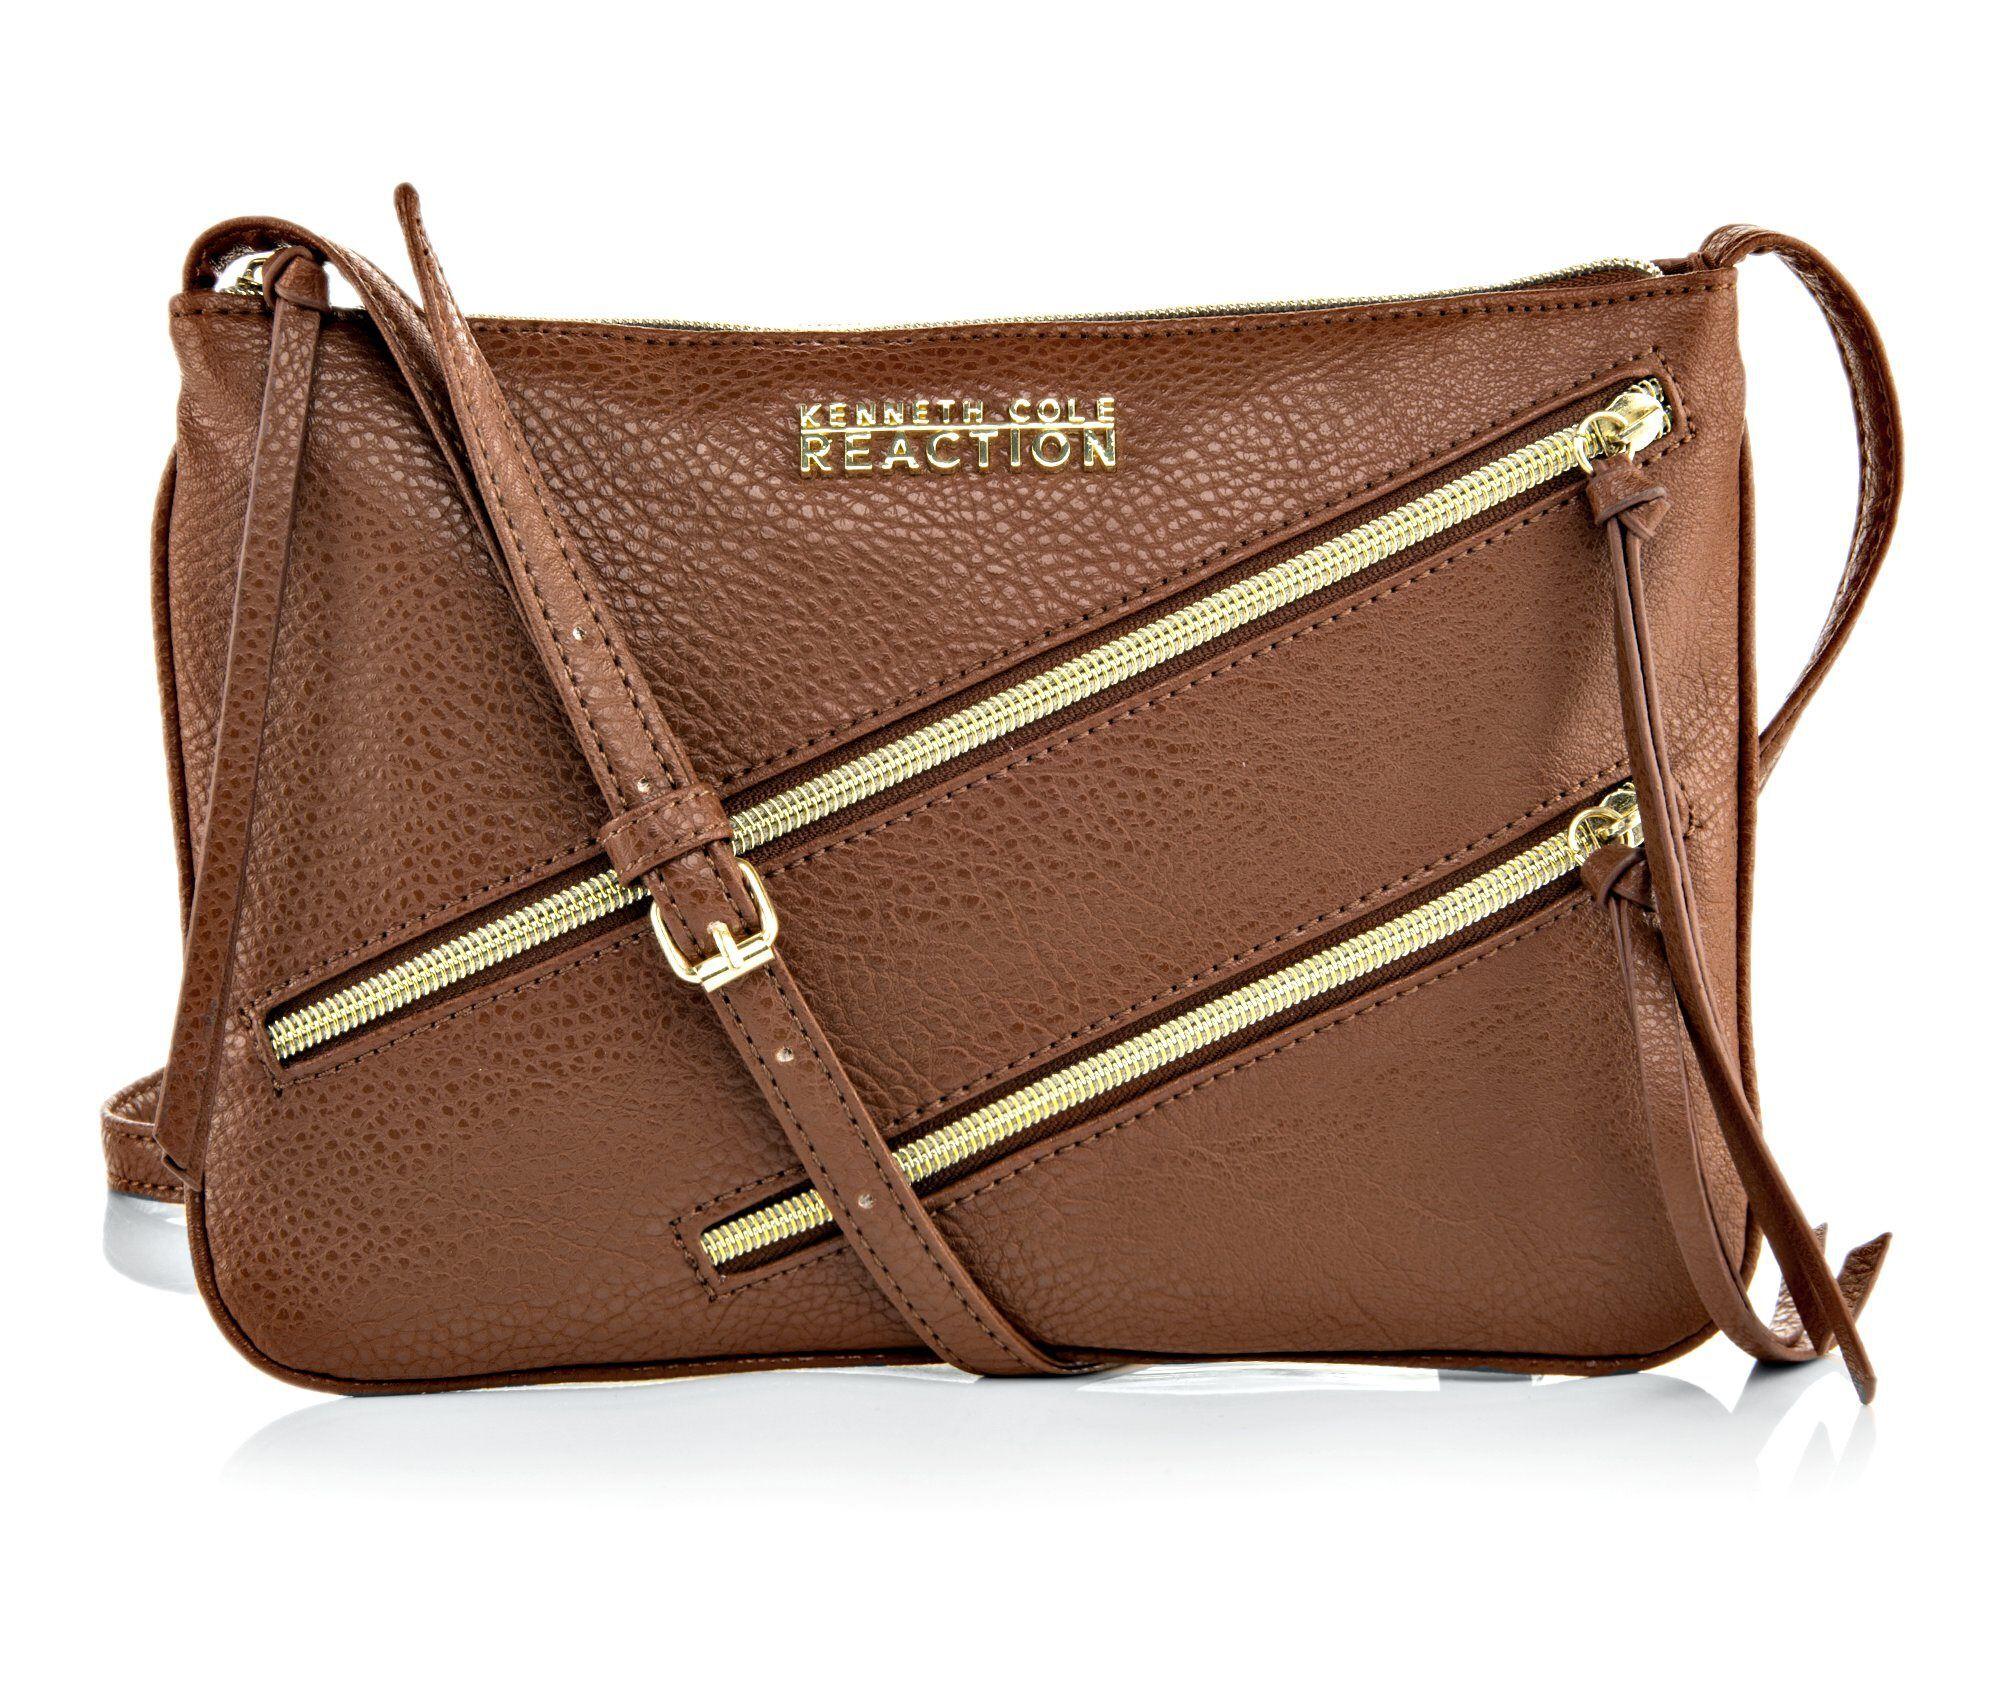 Kenneth Cole Reaction Lasso Mini Crossbody Bag Merlot